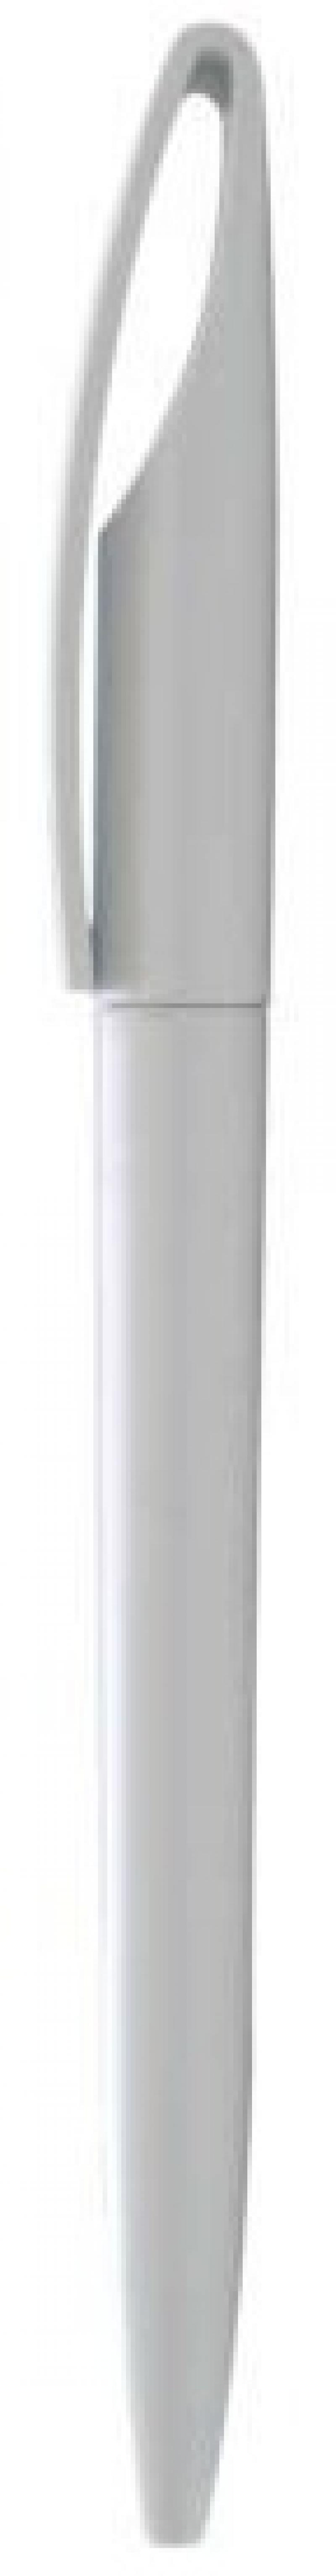 Фото - Шариковая ручка автоматическая SPONSOR SLP005A/WH синий 0.7 мм SLP005A/WH wh red